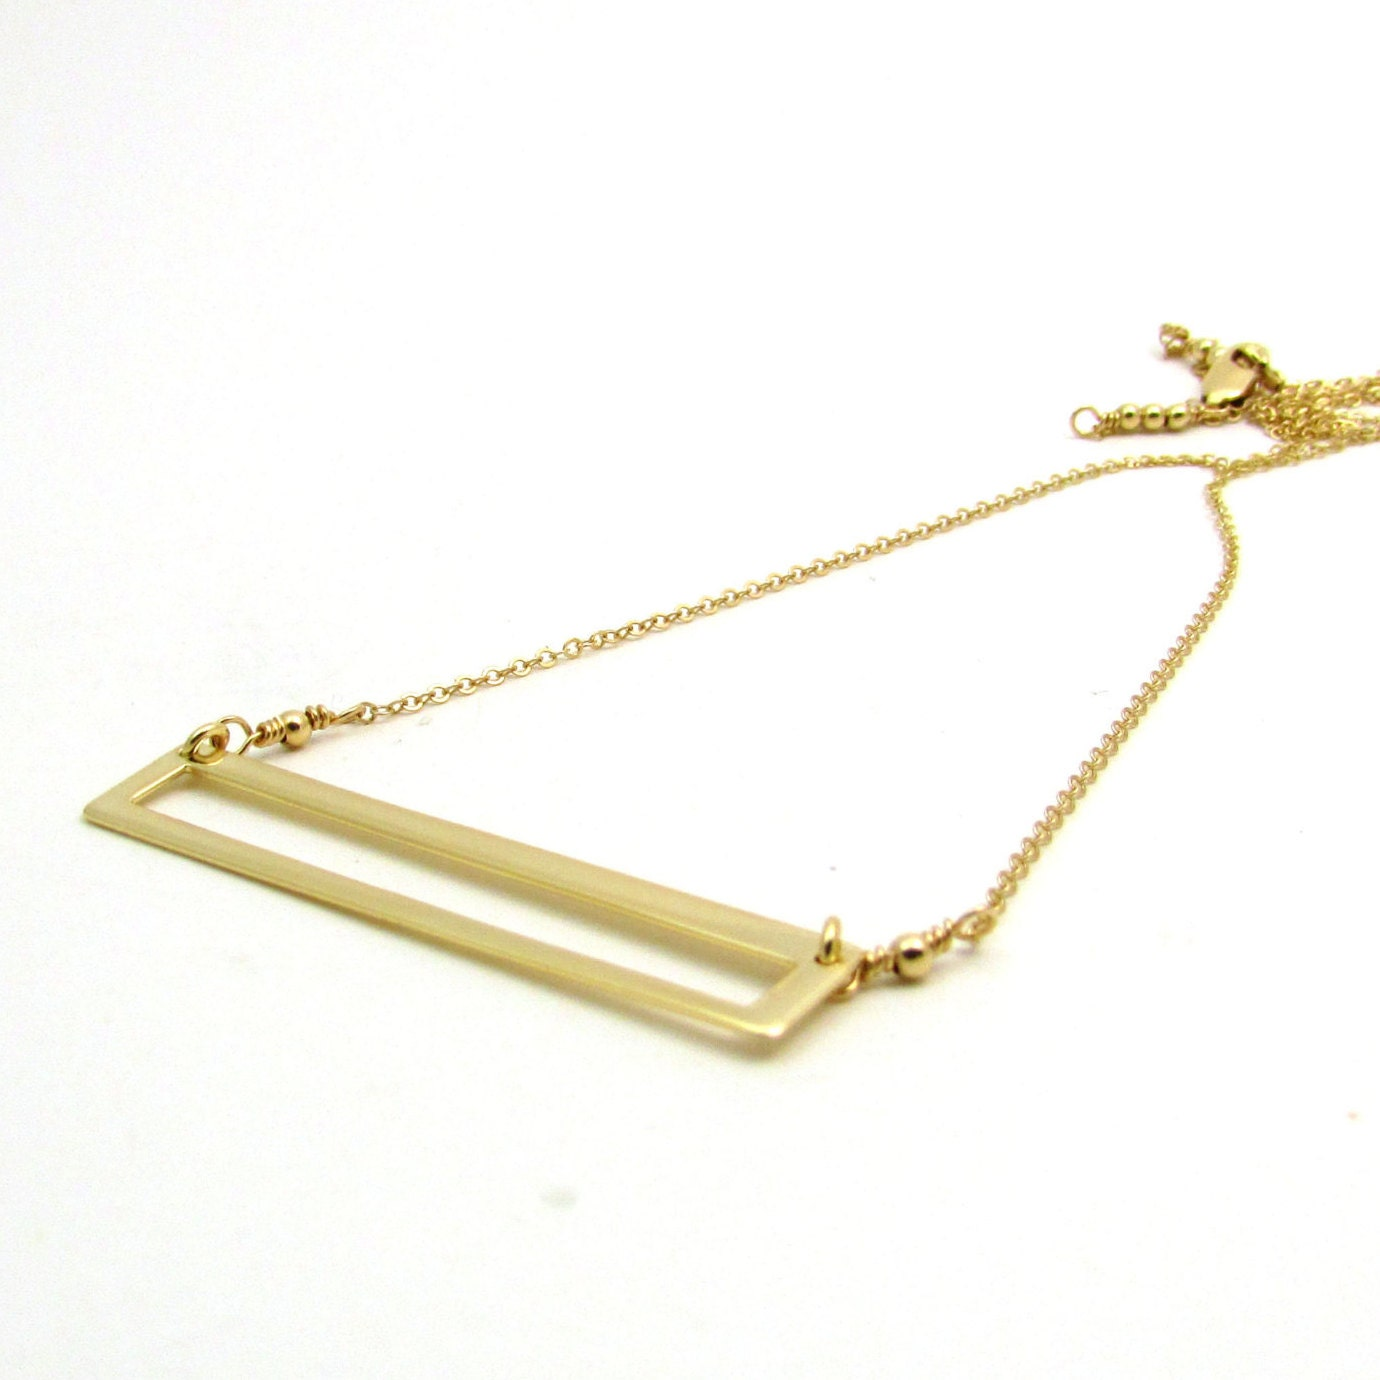 Gold Rectangle Necklace Gold Bar Necklace By Felisajewelry. Matte Gold Engagement Rings. Cool Bracelet. Cocoa Diamond. Anklet 14k. Pave Diamond Bangle Bracelet. Sunstone Engagement Rings. Youtube Beads10k Gold Bracelet. Thin Titanium Watches